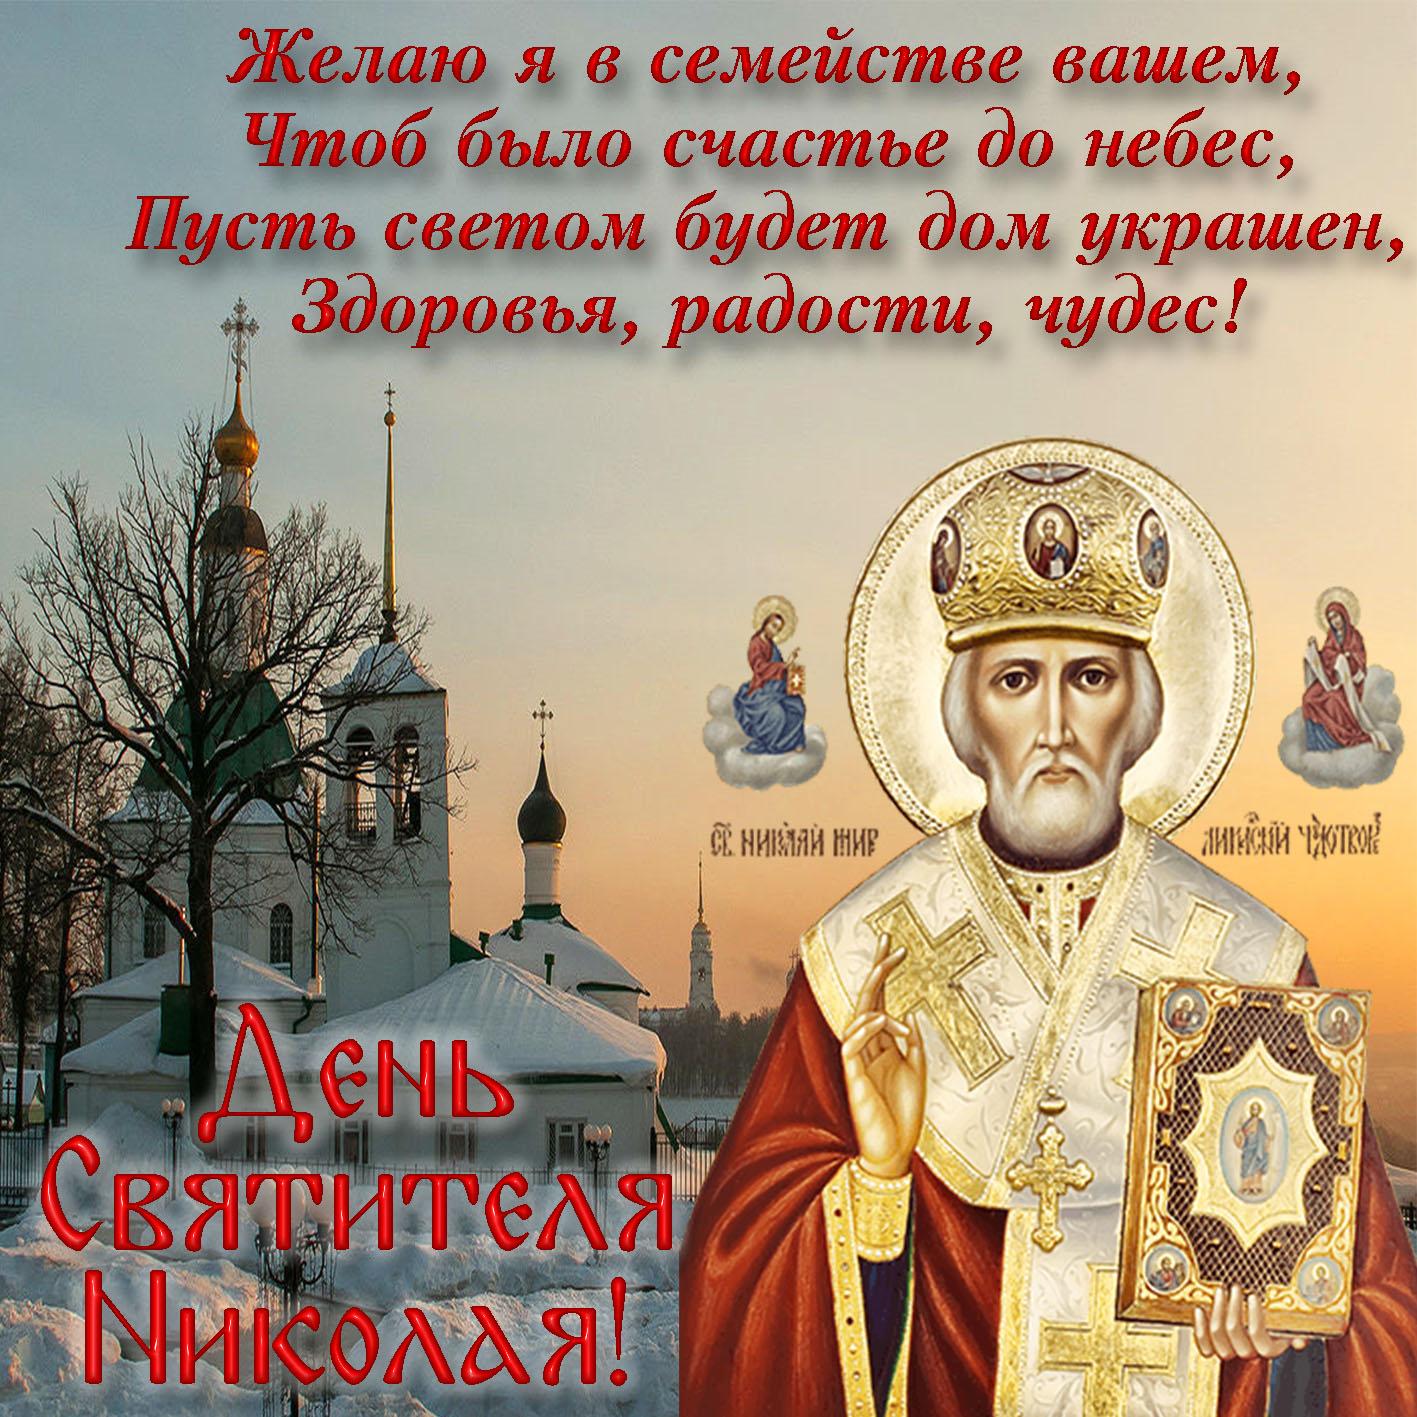 Открытки с днем святого николая чудотворца с пожеланиями